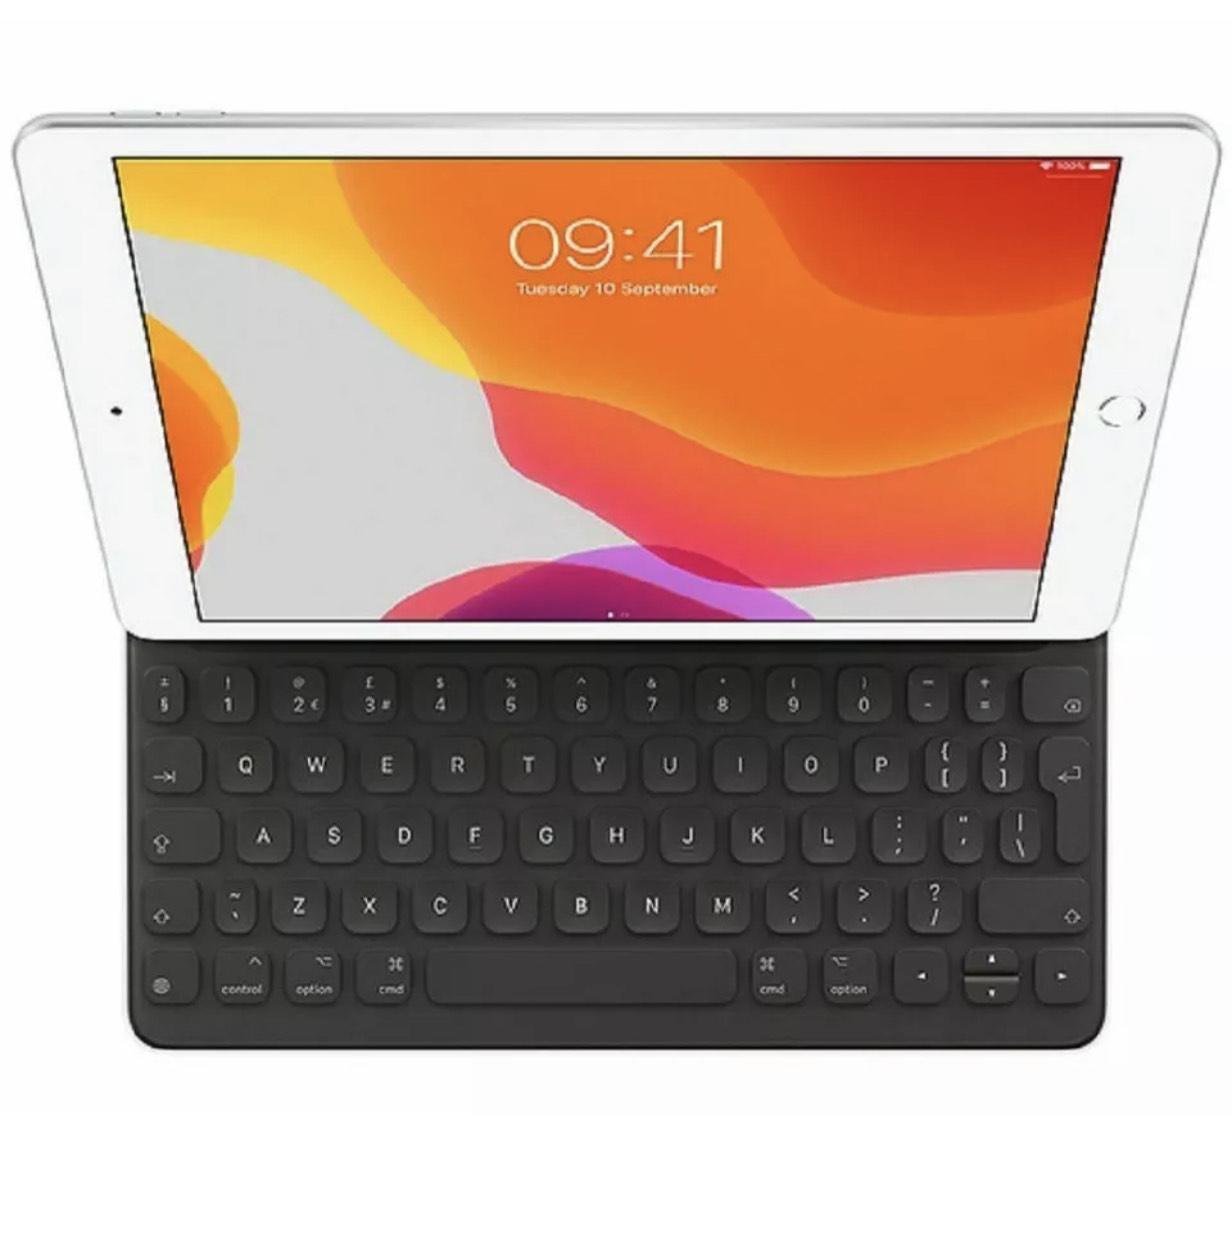 "APPLE 10.2"" & 10.5"" iPad Smart Keyboard Folio Case - Black £80.75 with code (UK Mainland / NI) @ ebay / currys_clearance"